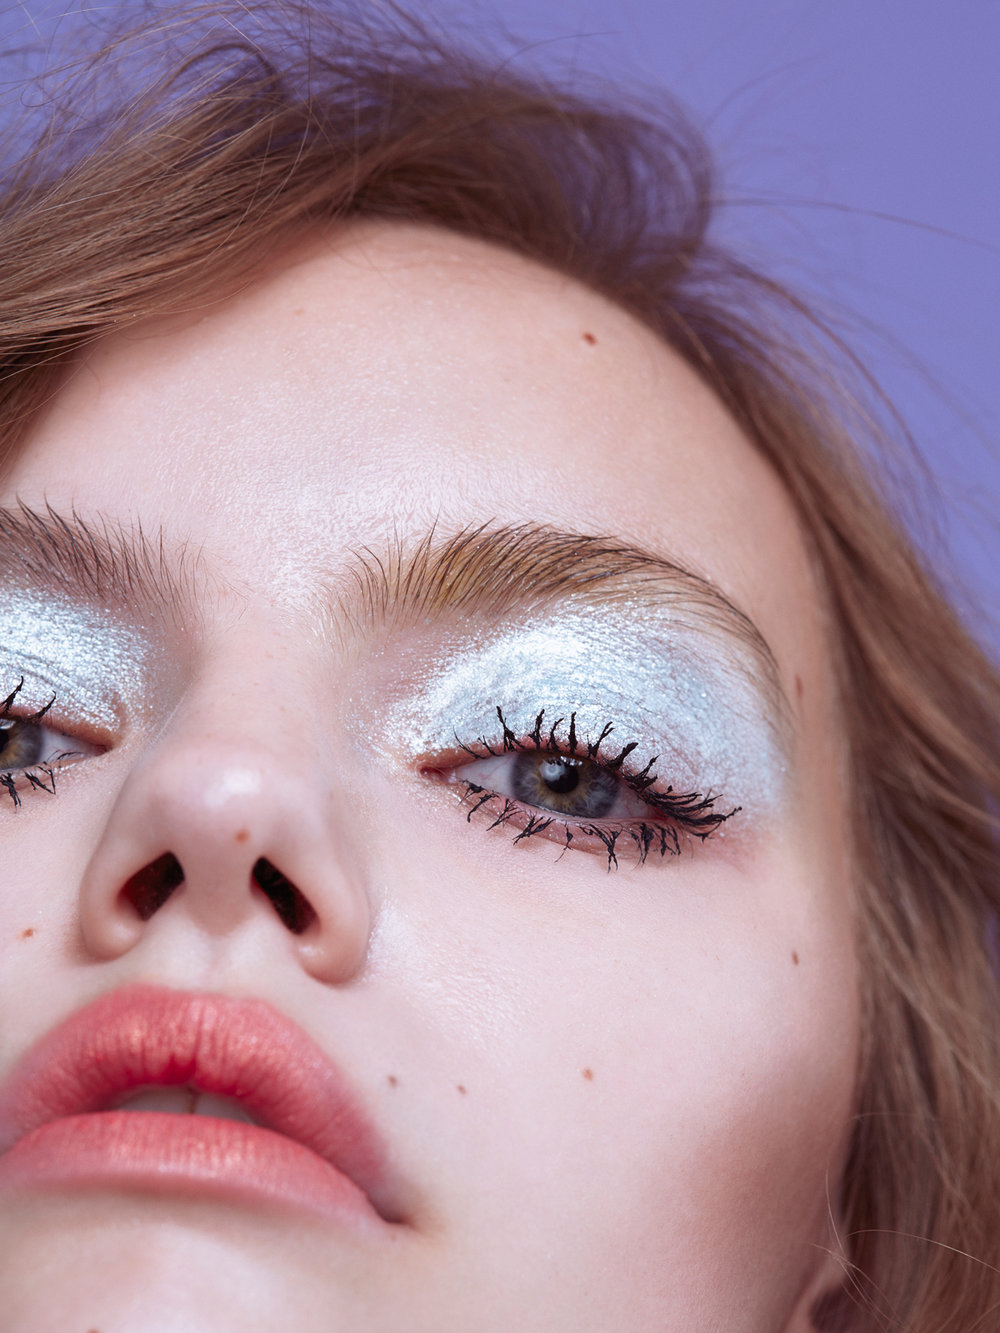 Emilie+Tournevache+Beauty+Fashion+Portrait+Photographer+Montreal.jpg